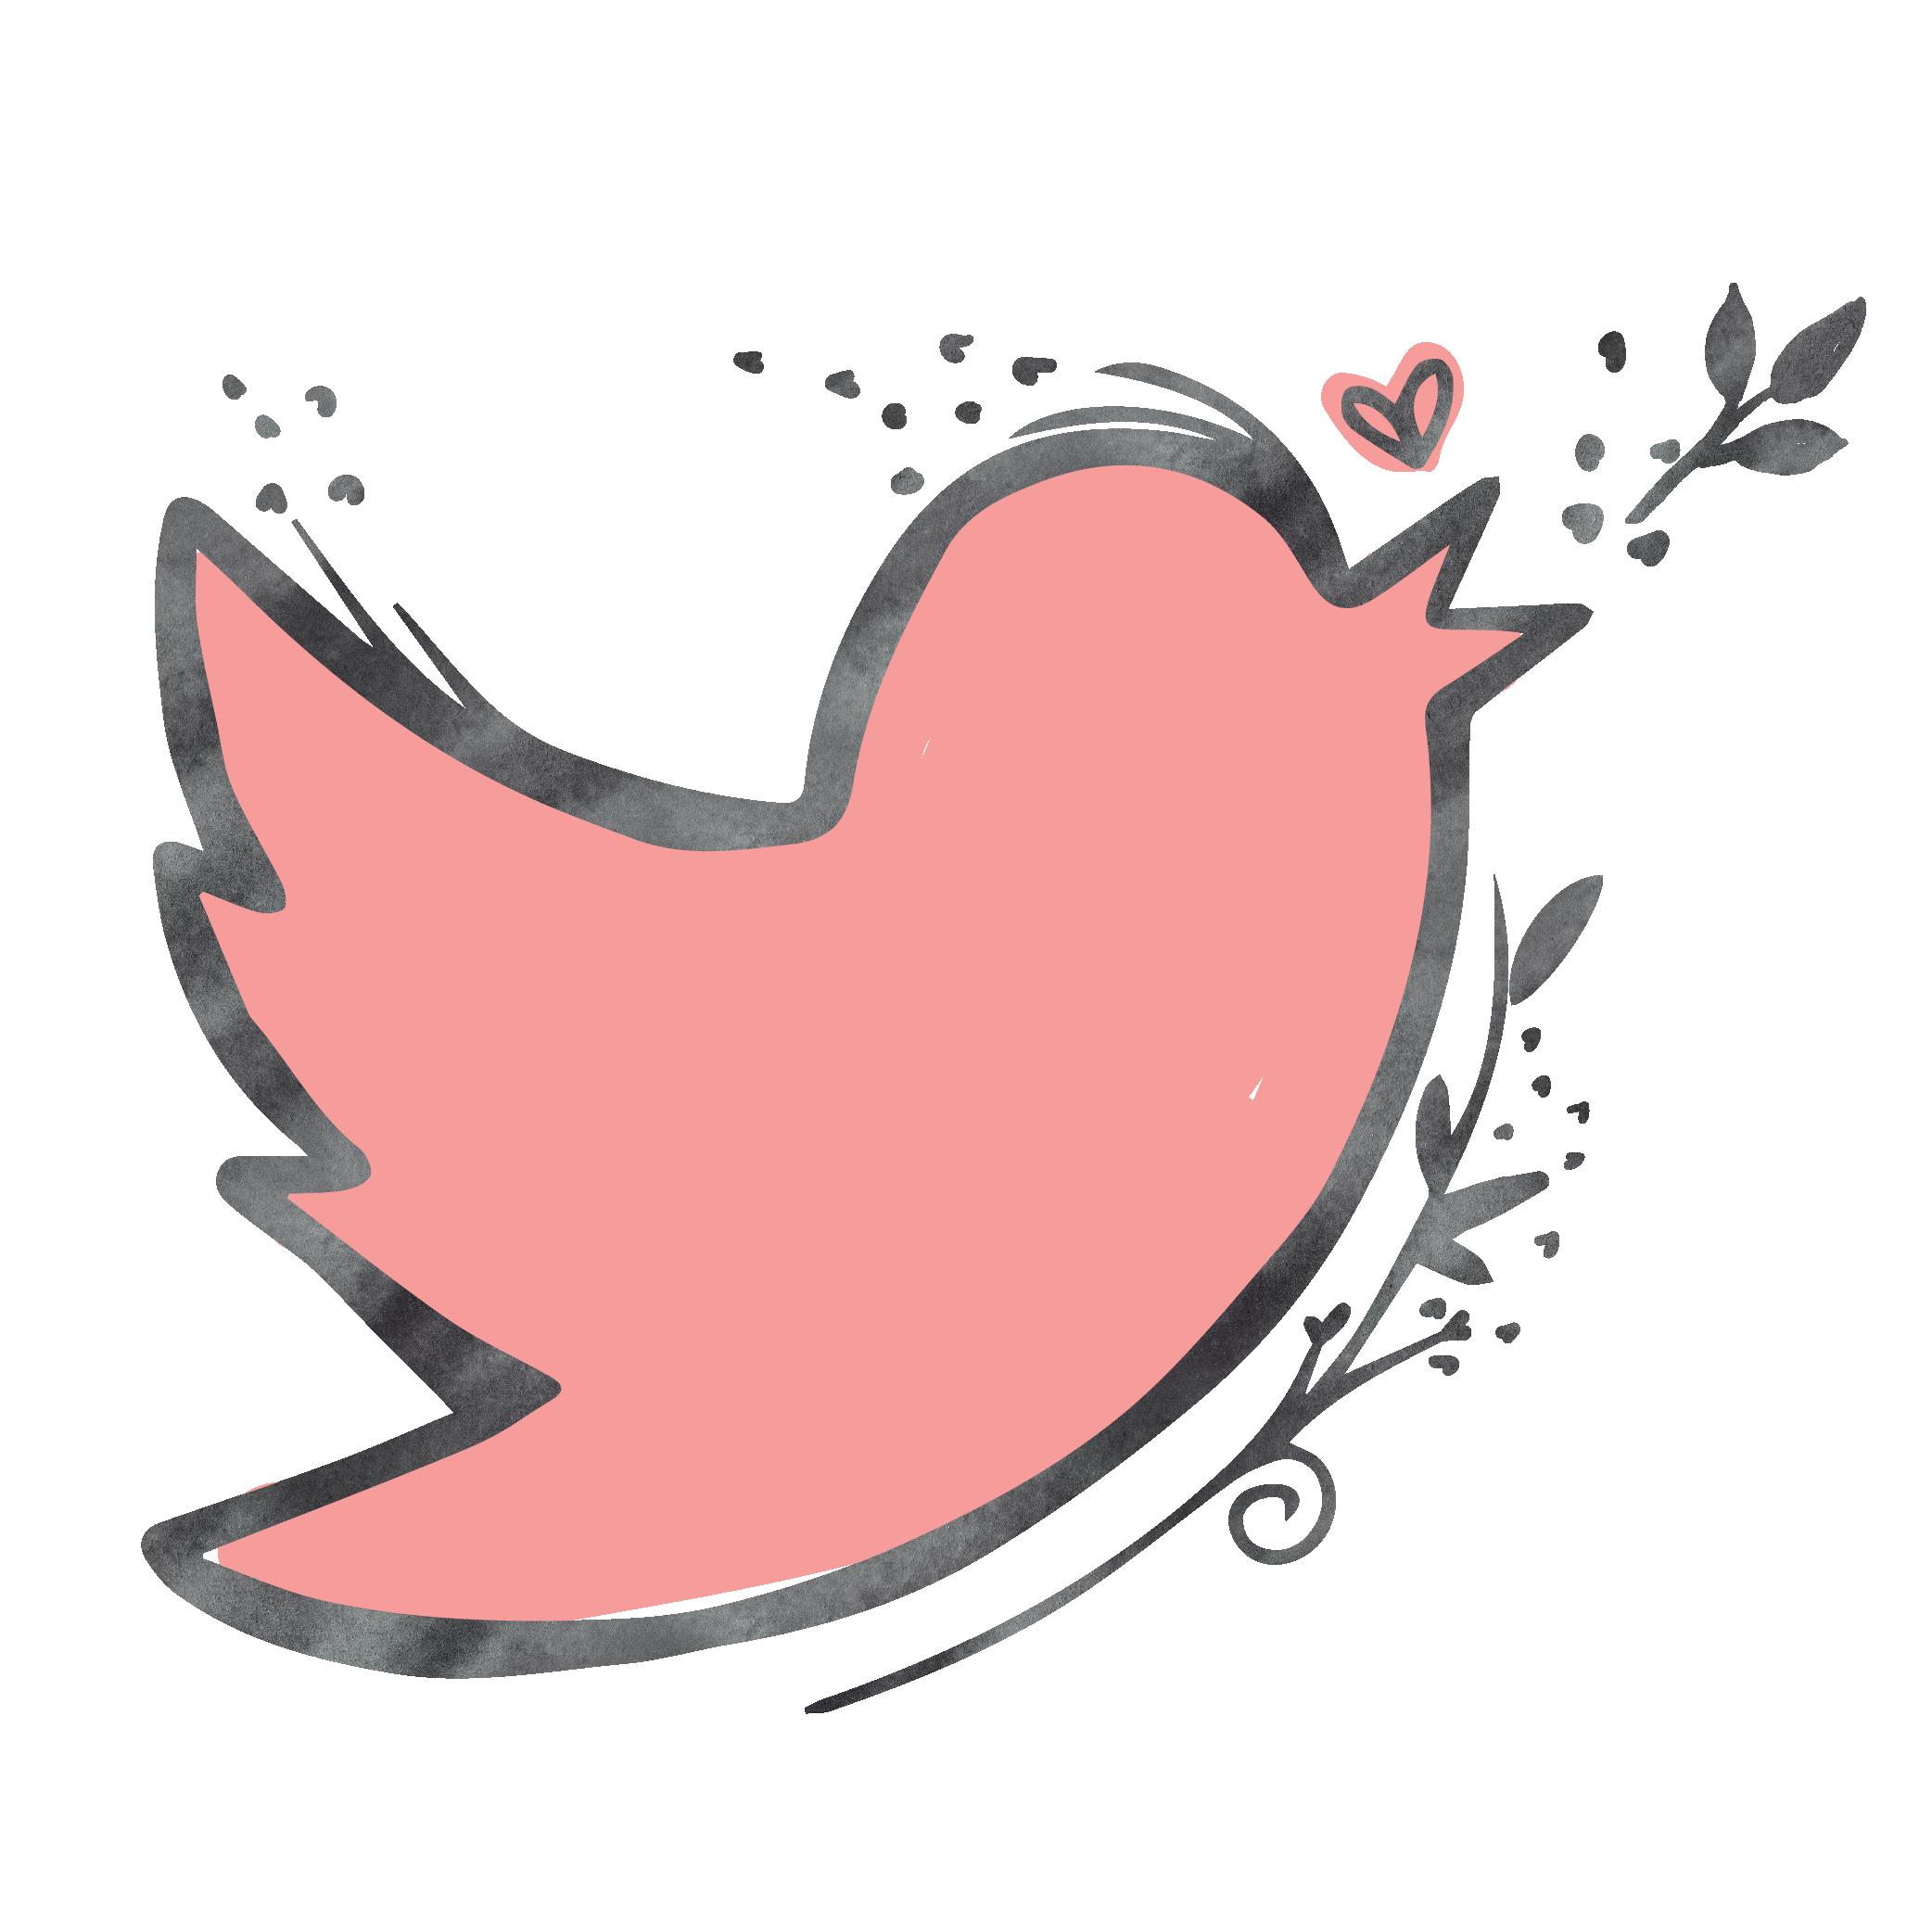 Favorite quotes twitter. Eyelashes clipart winged eyeliner